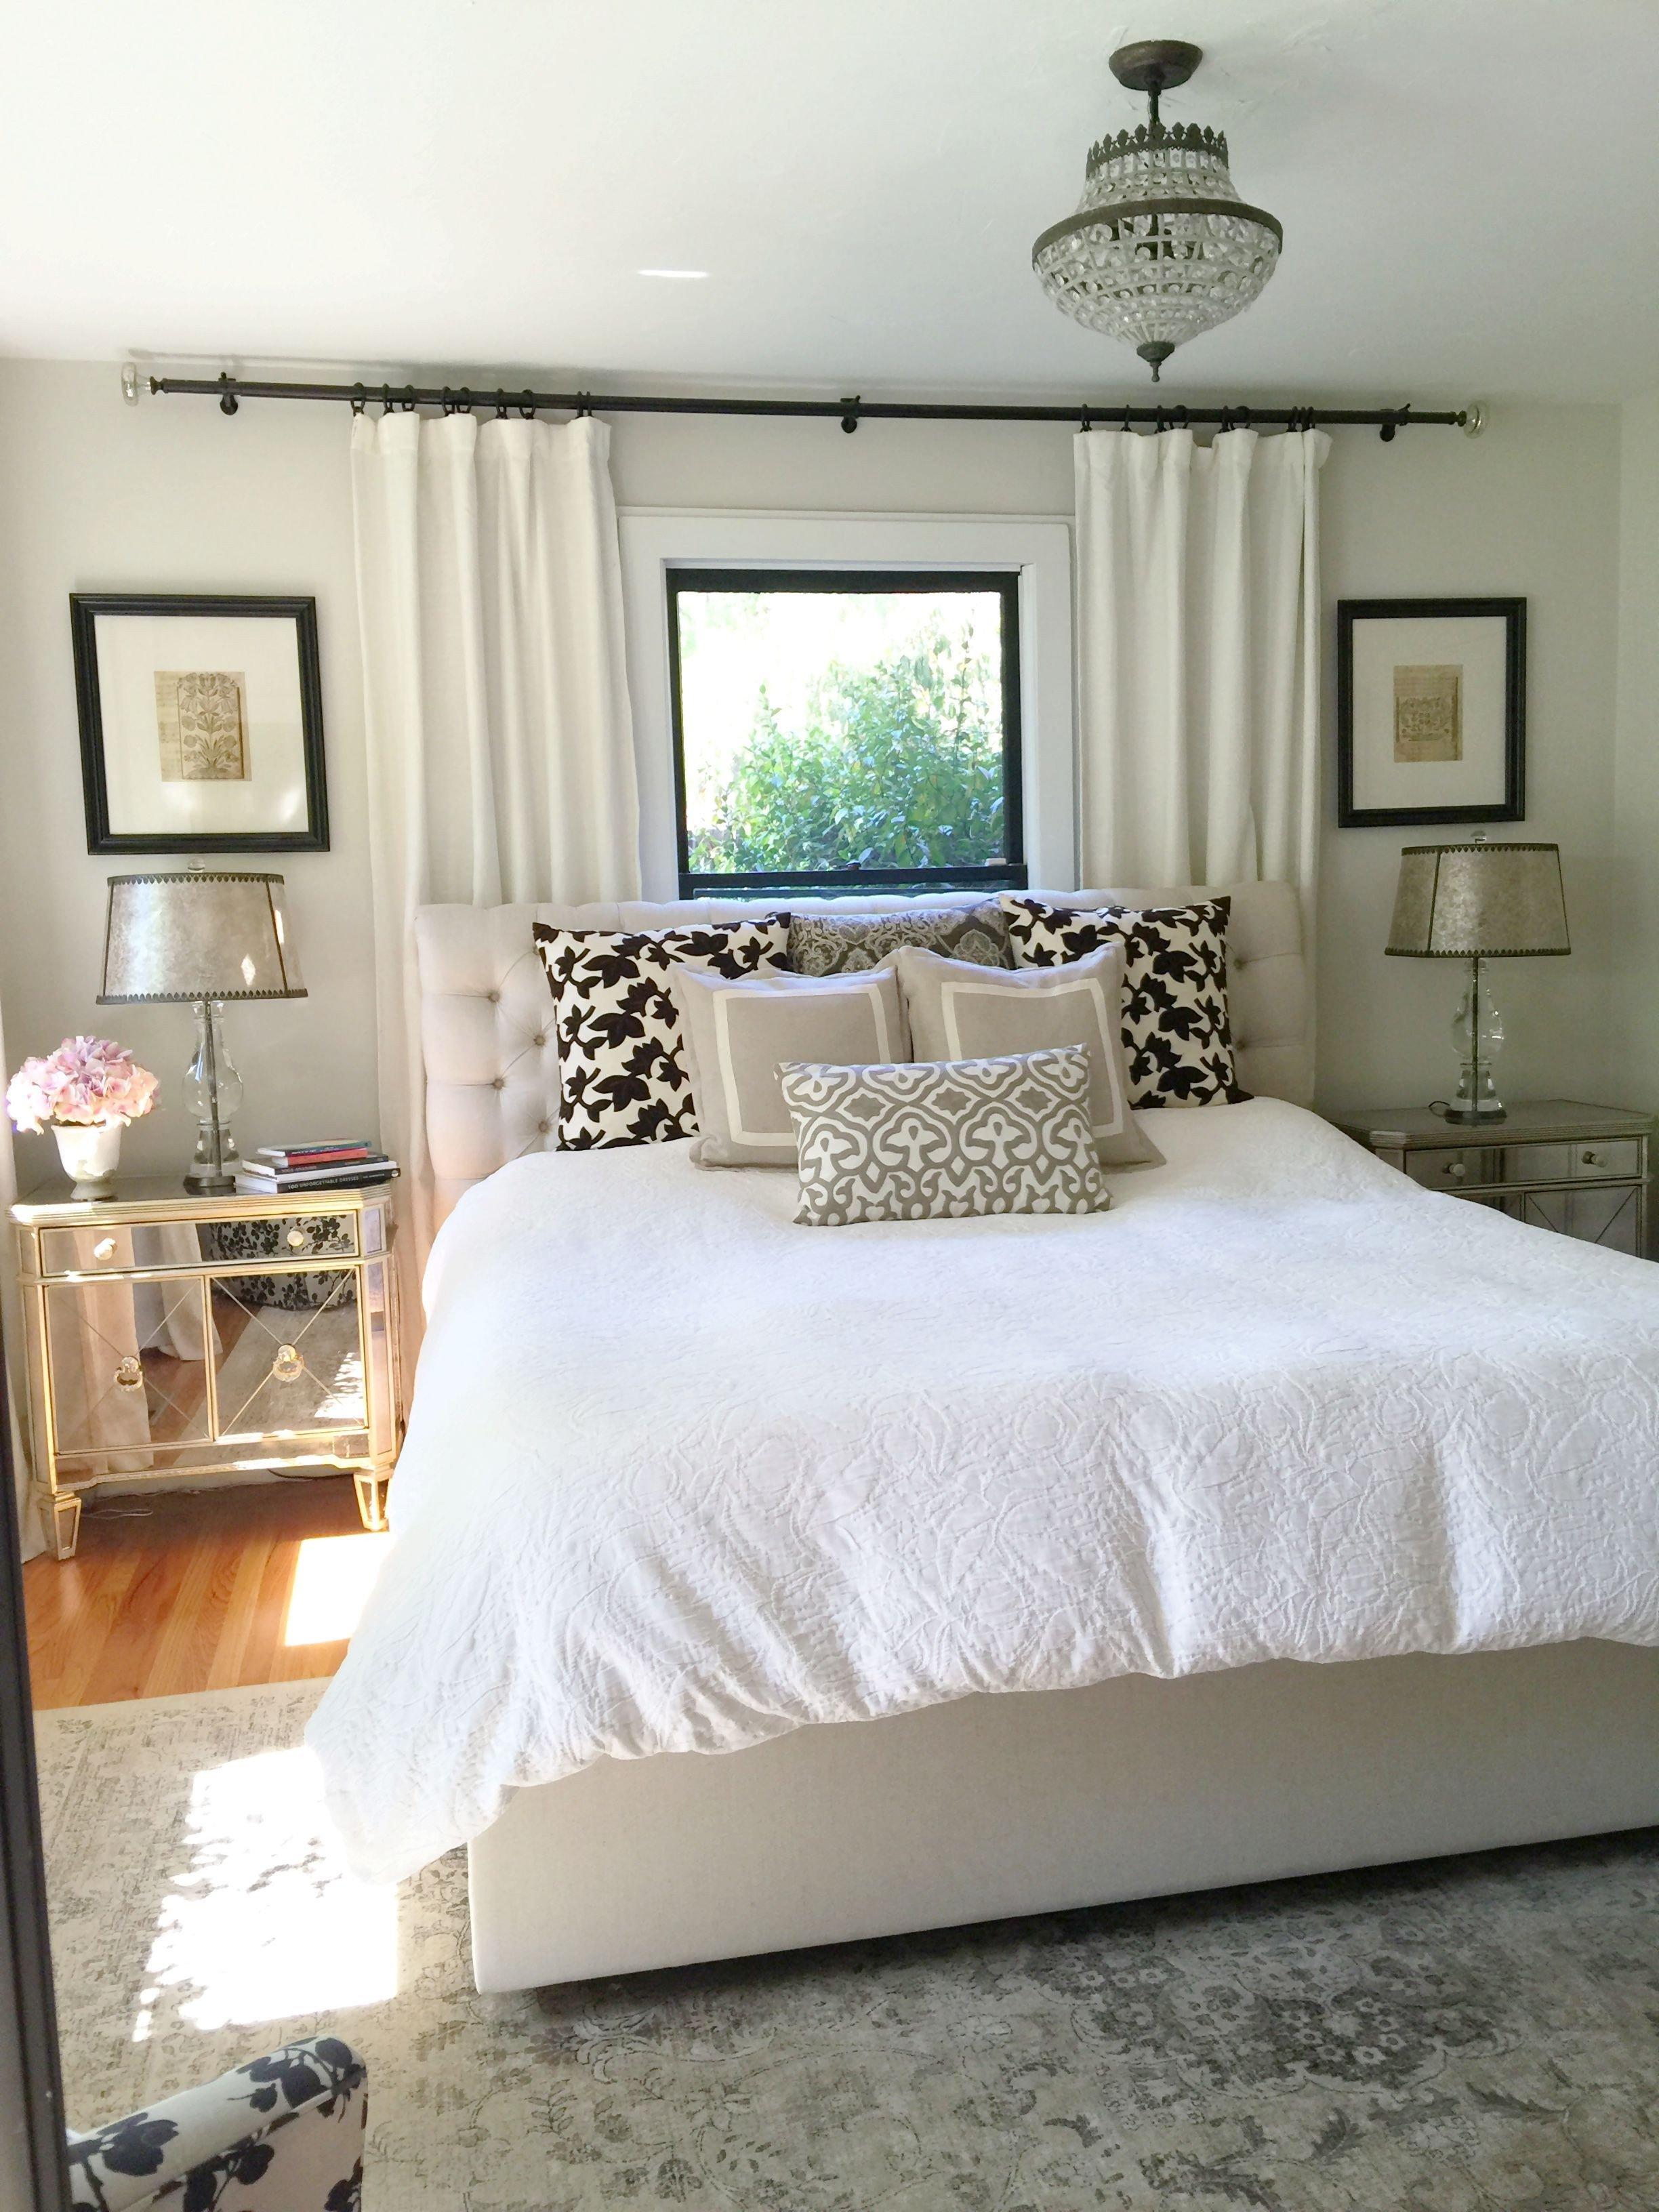 Curtain Styles for Bedroom New Neutral Bedroom Window Behind Bed Bedroom Window